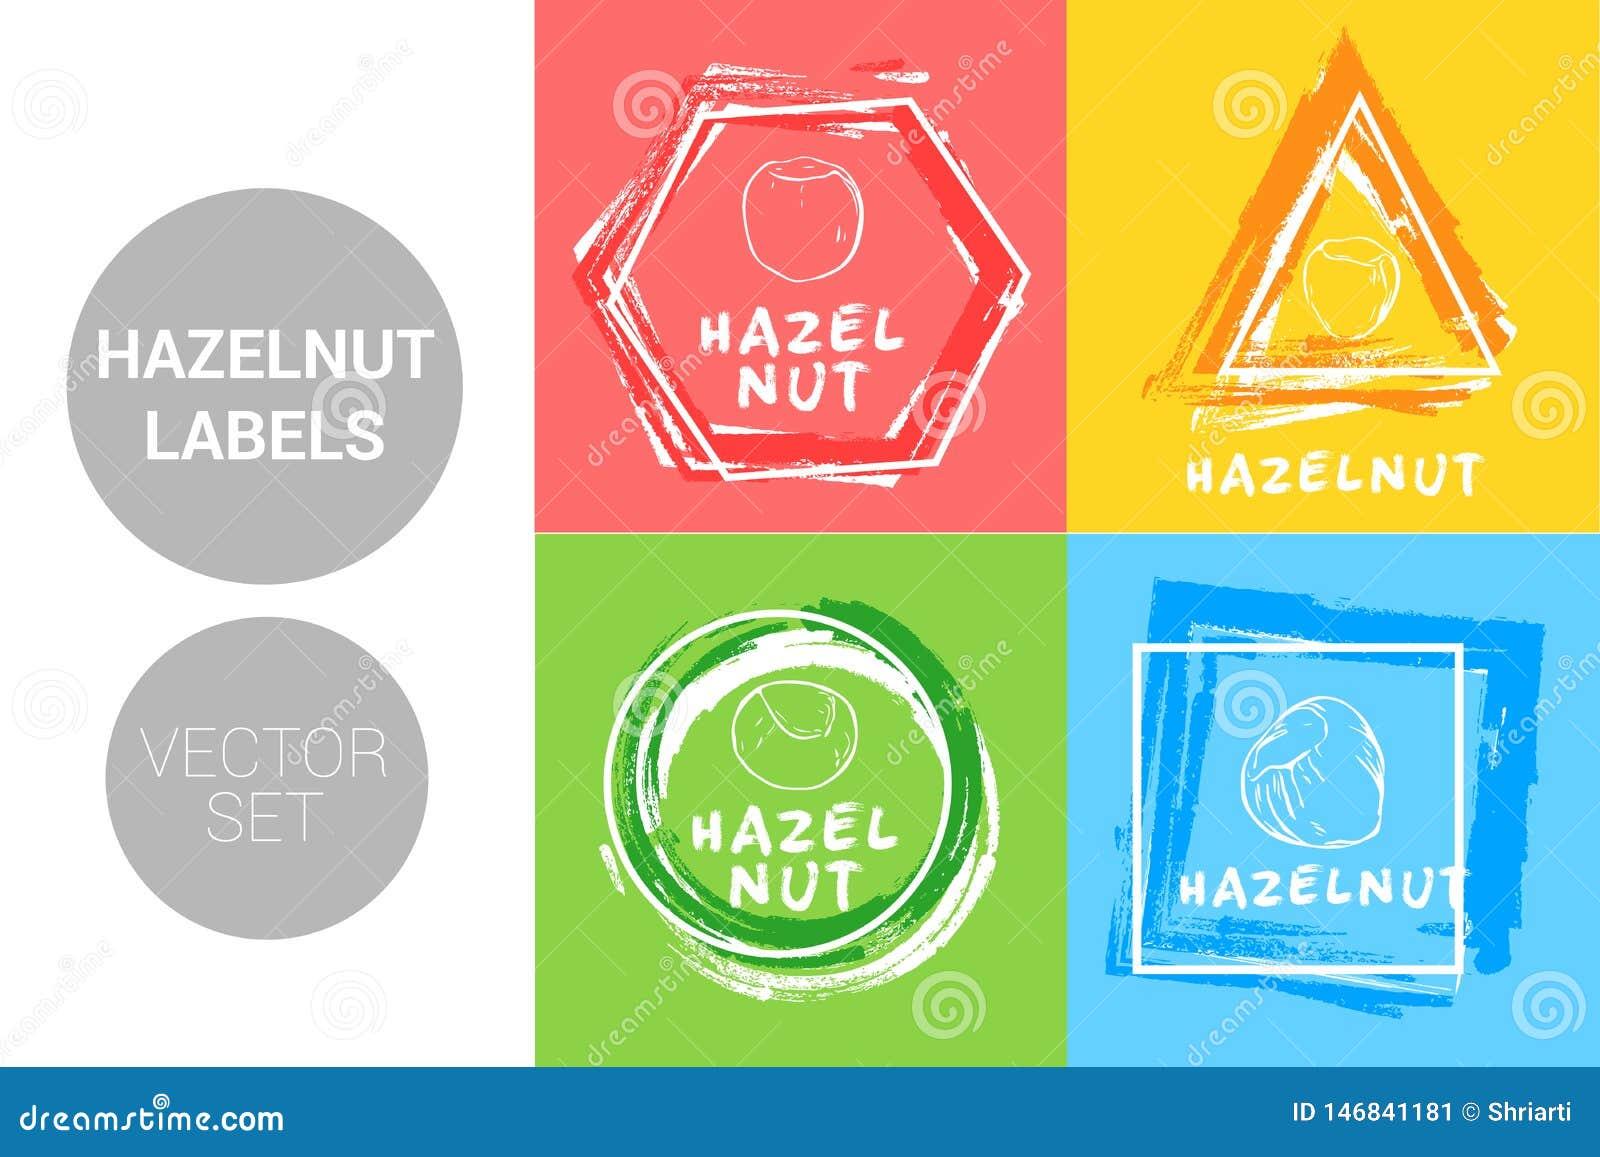 Hazelnut colorful label set. Raw organic nuts Badge shapes. Creative Nut tags.